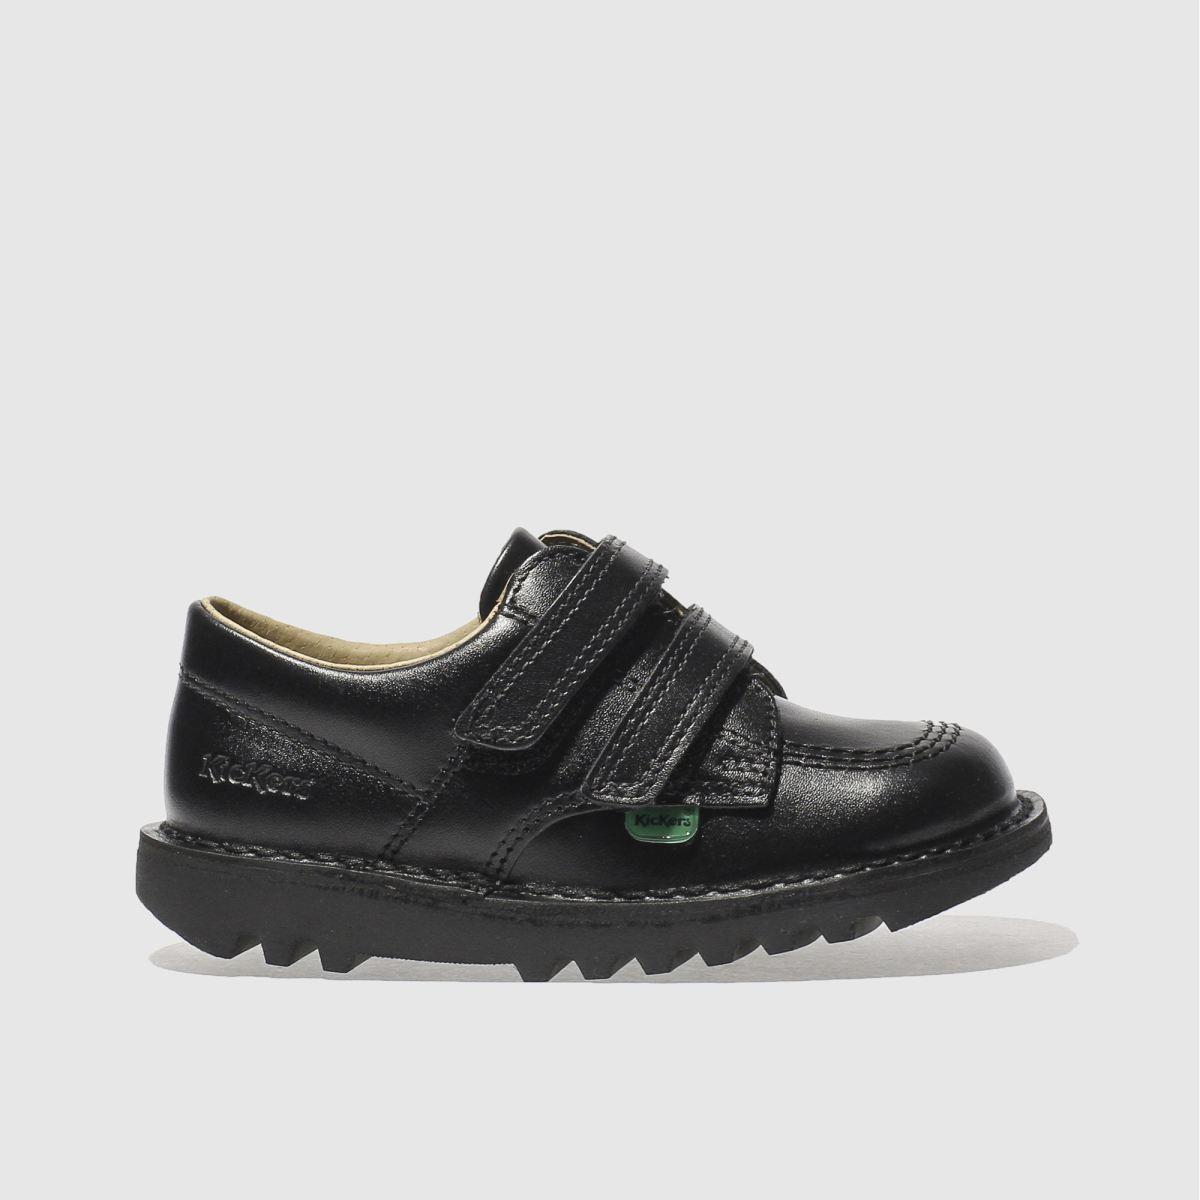 Kickers Black Kick Lo Shoes Toddler